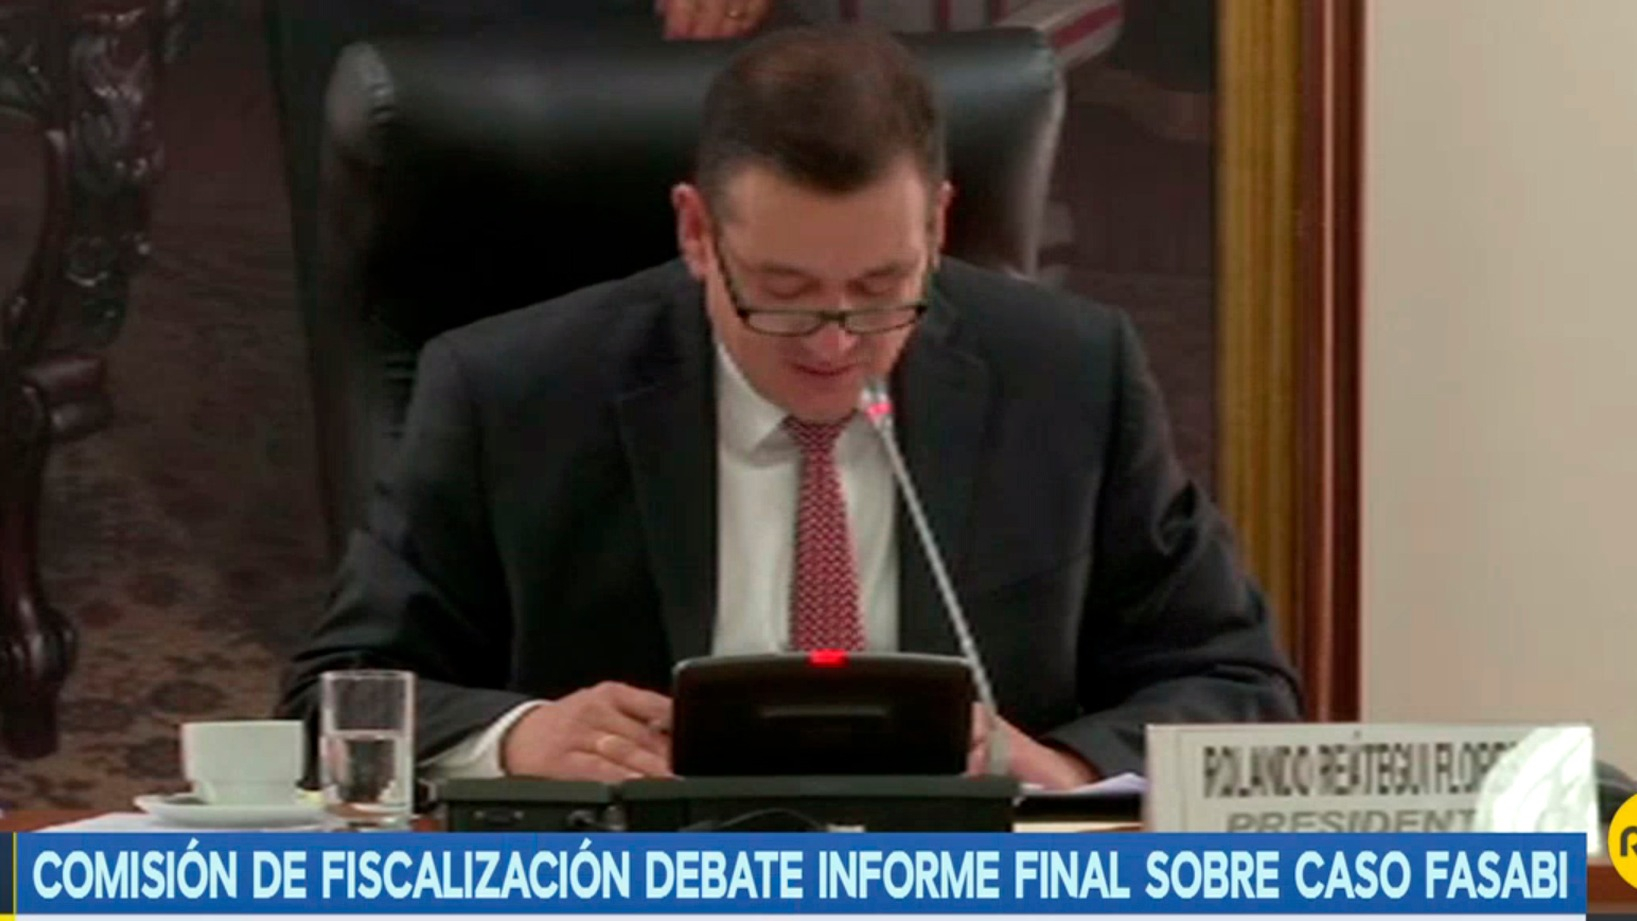 La Comisión de Fiscalización debate informe final sobre caso Fasabi